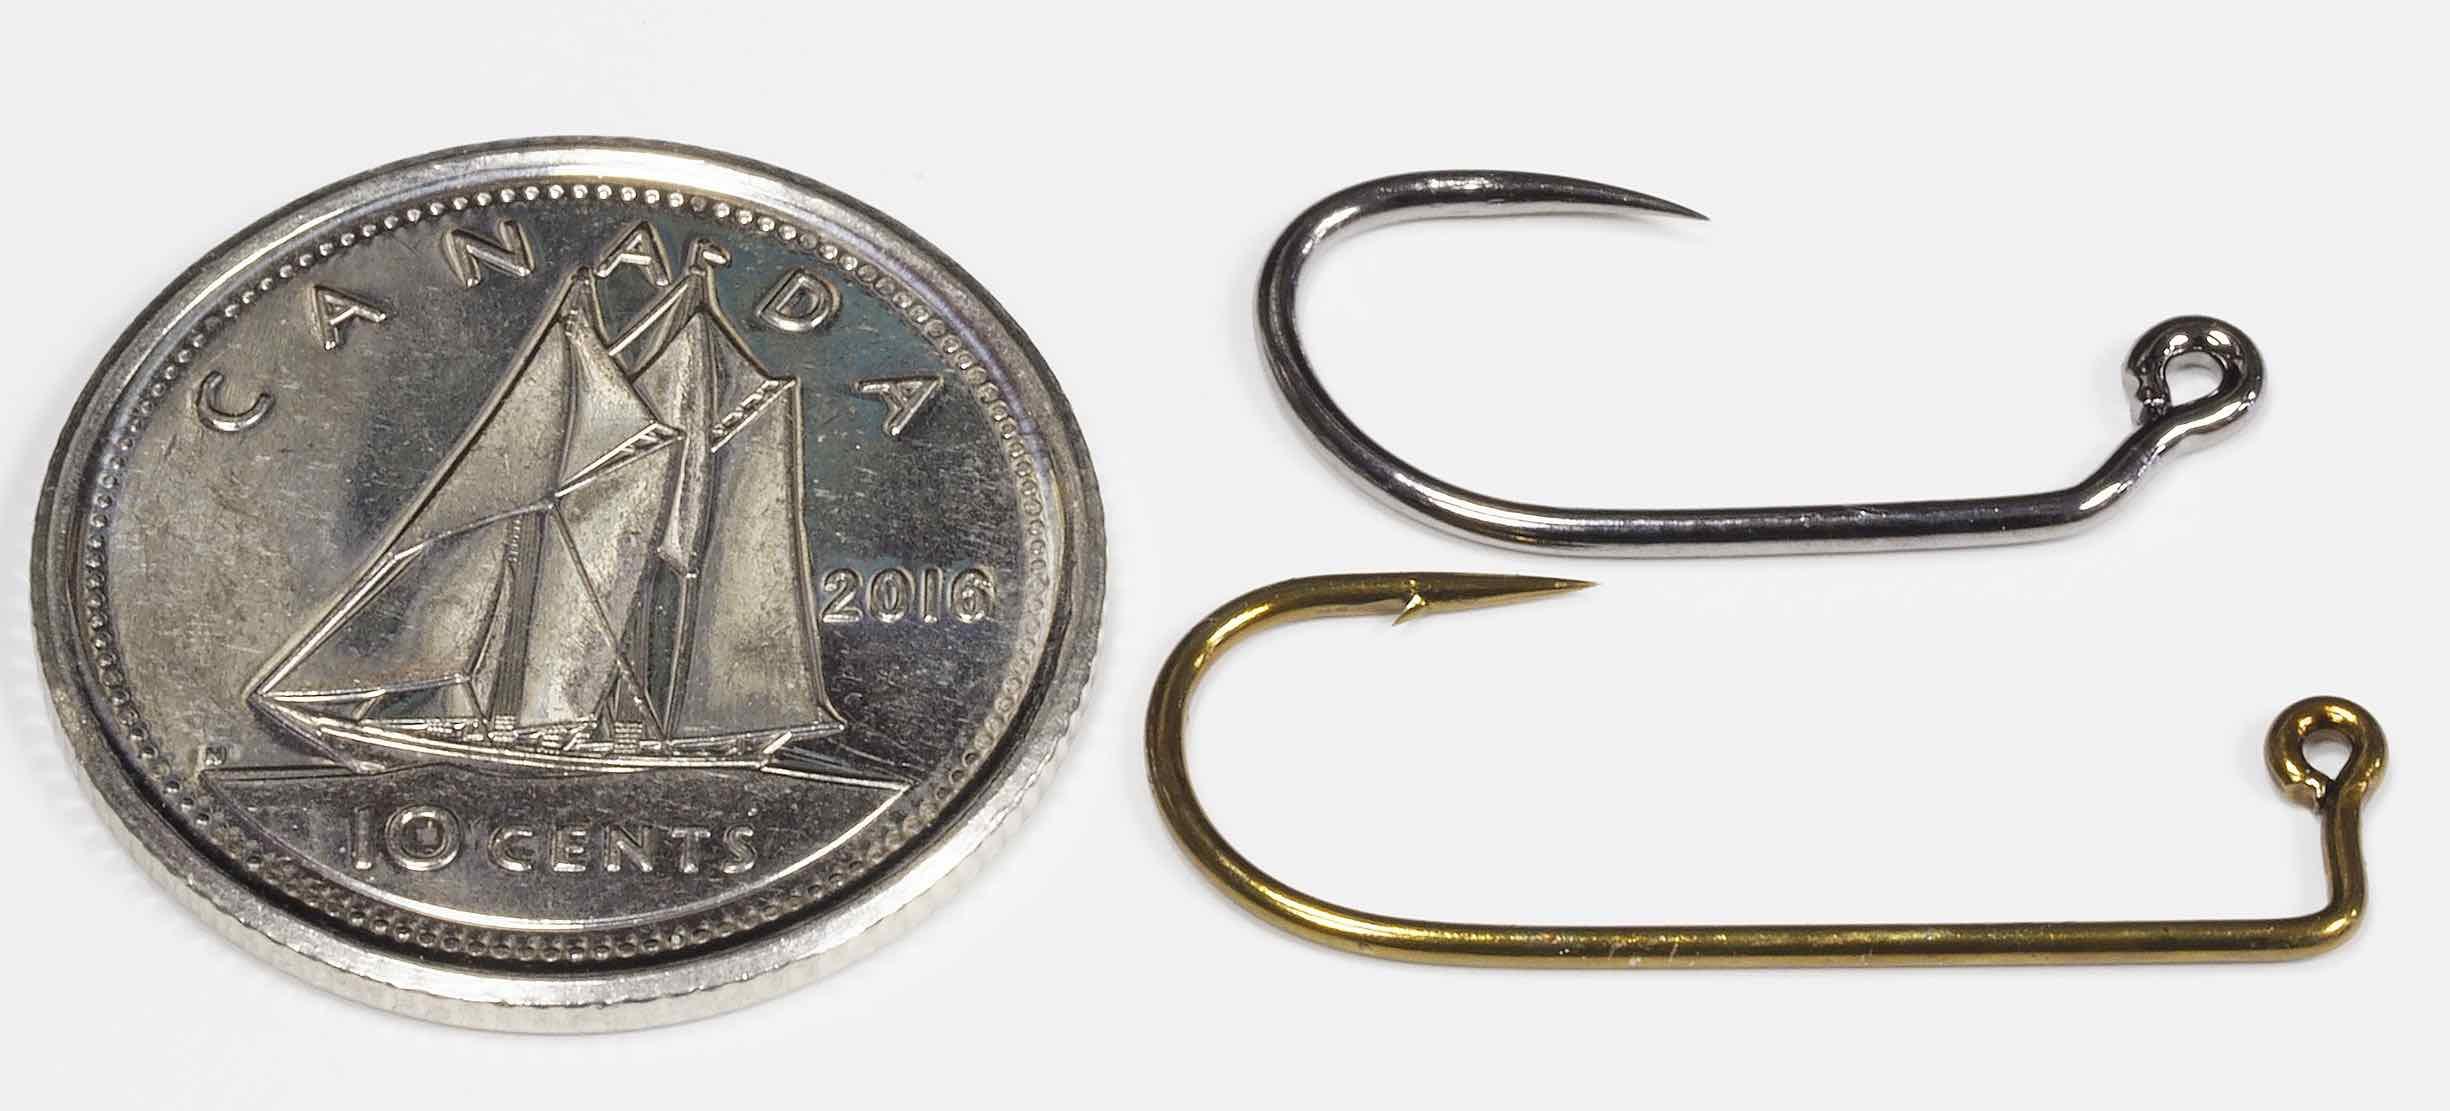 Fly Tying Jig Hooks for Bead Heads